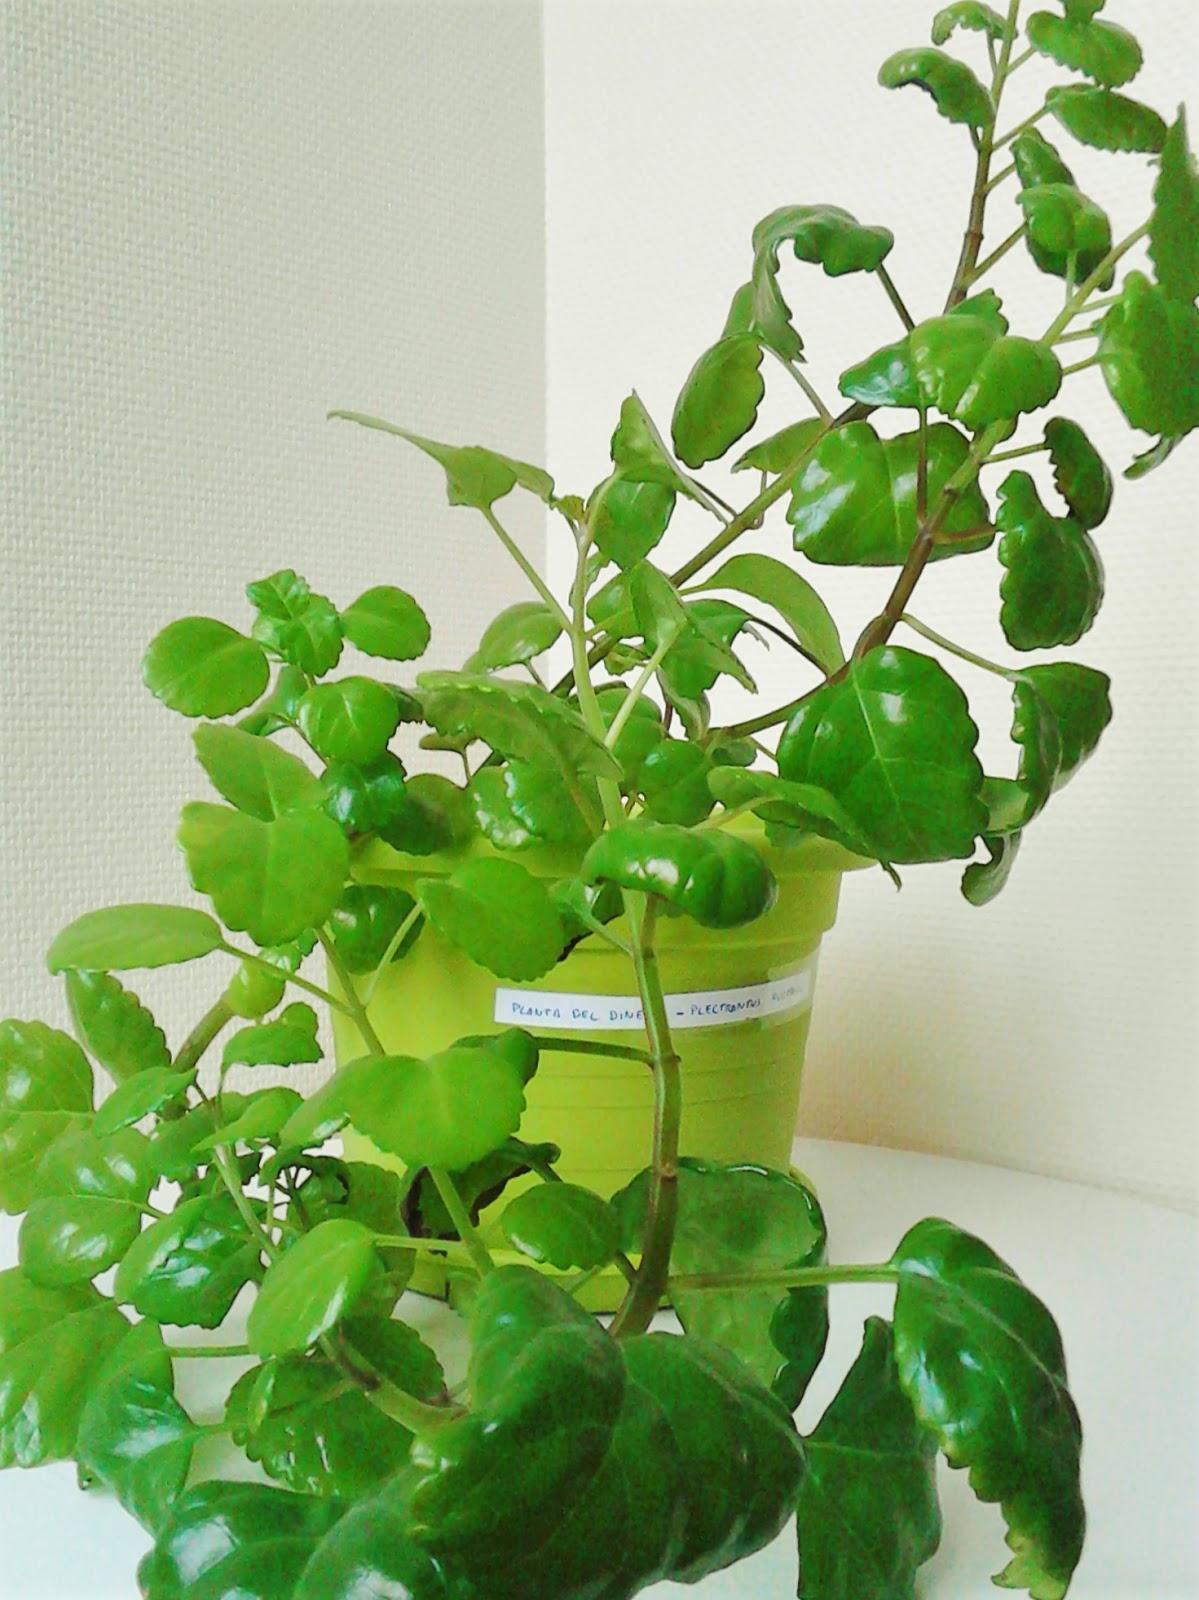 La ventana de javiruli plantas de interior 33 planta - Plantas del interior ...